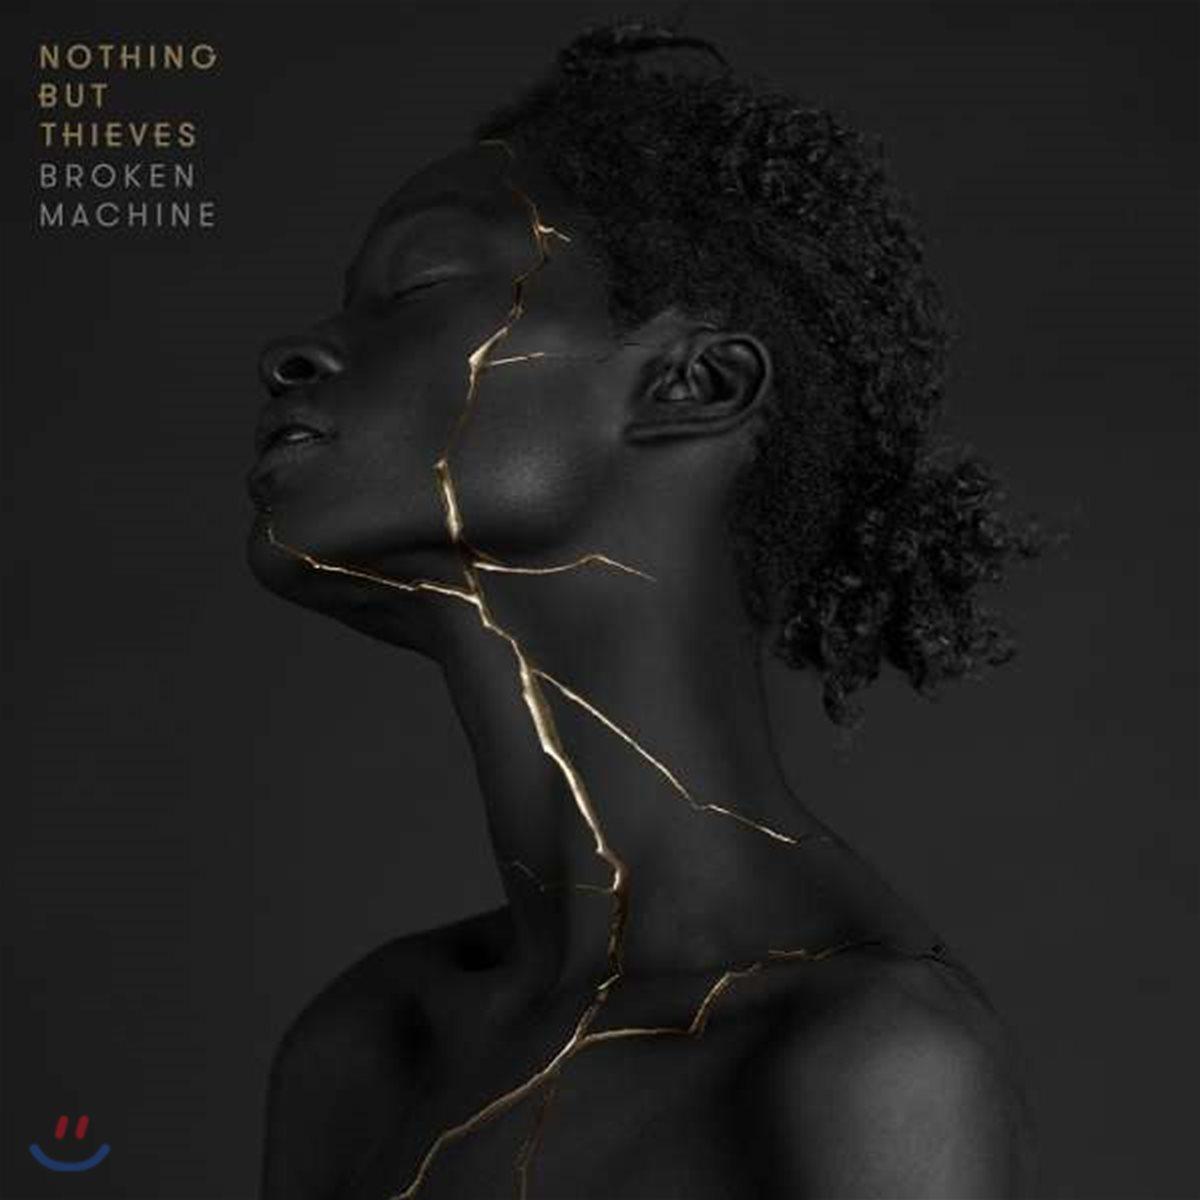 Nothing But Thieves (나씽 벗 띠브스) - Broken Machine (Deluxe Edition)